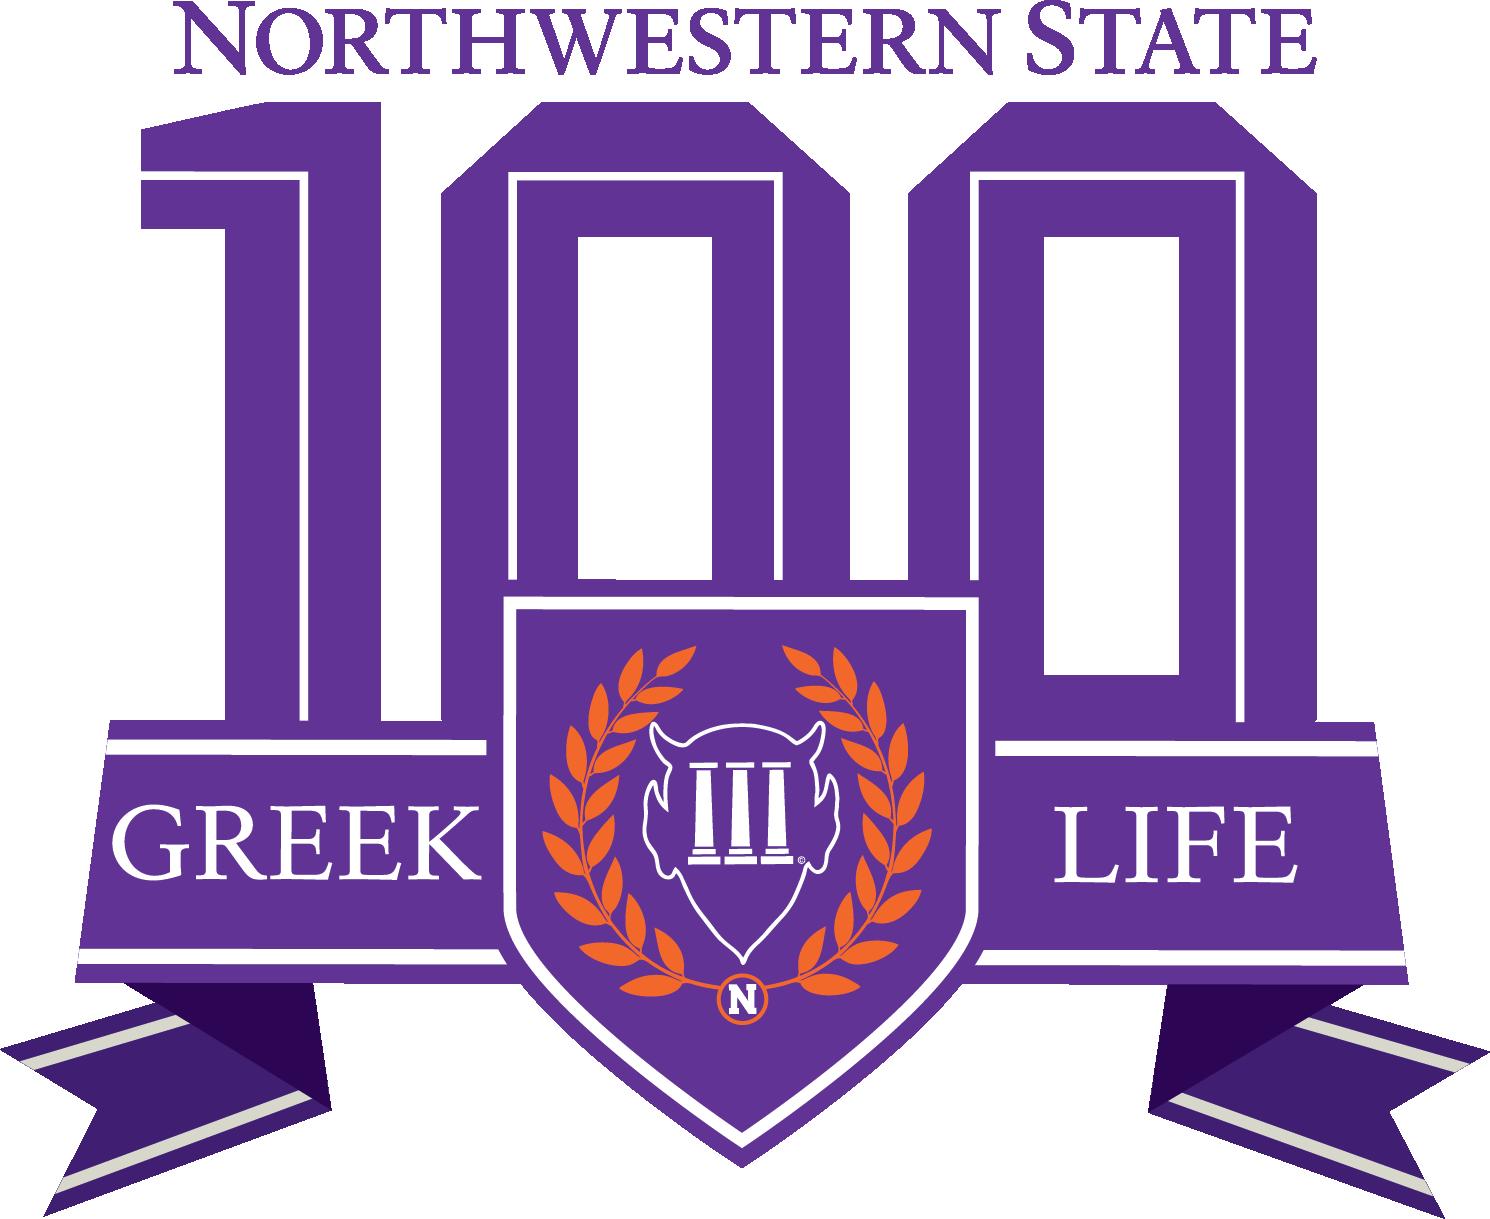 Northwestern State Greek Life Centennial Celebration